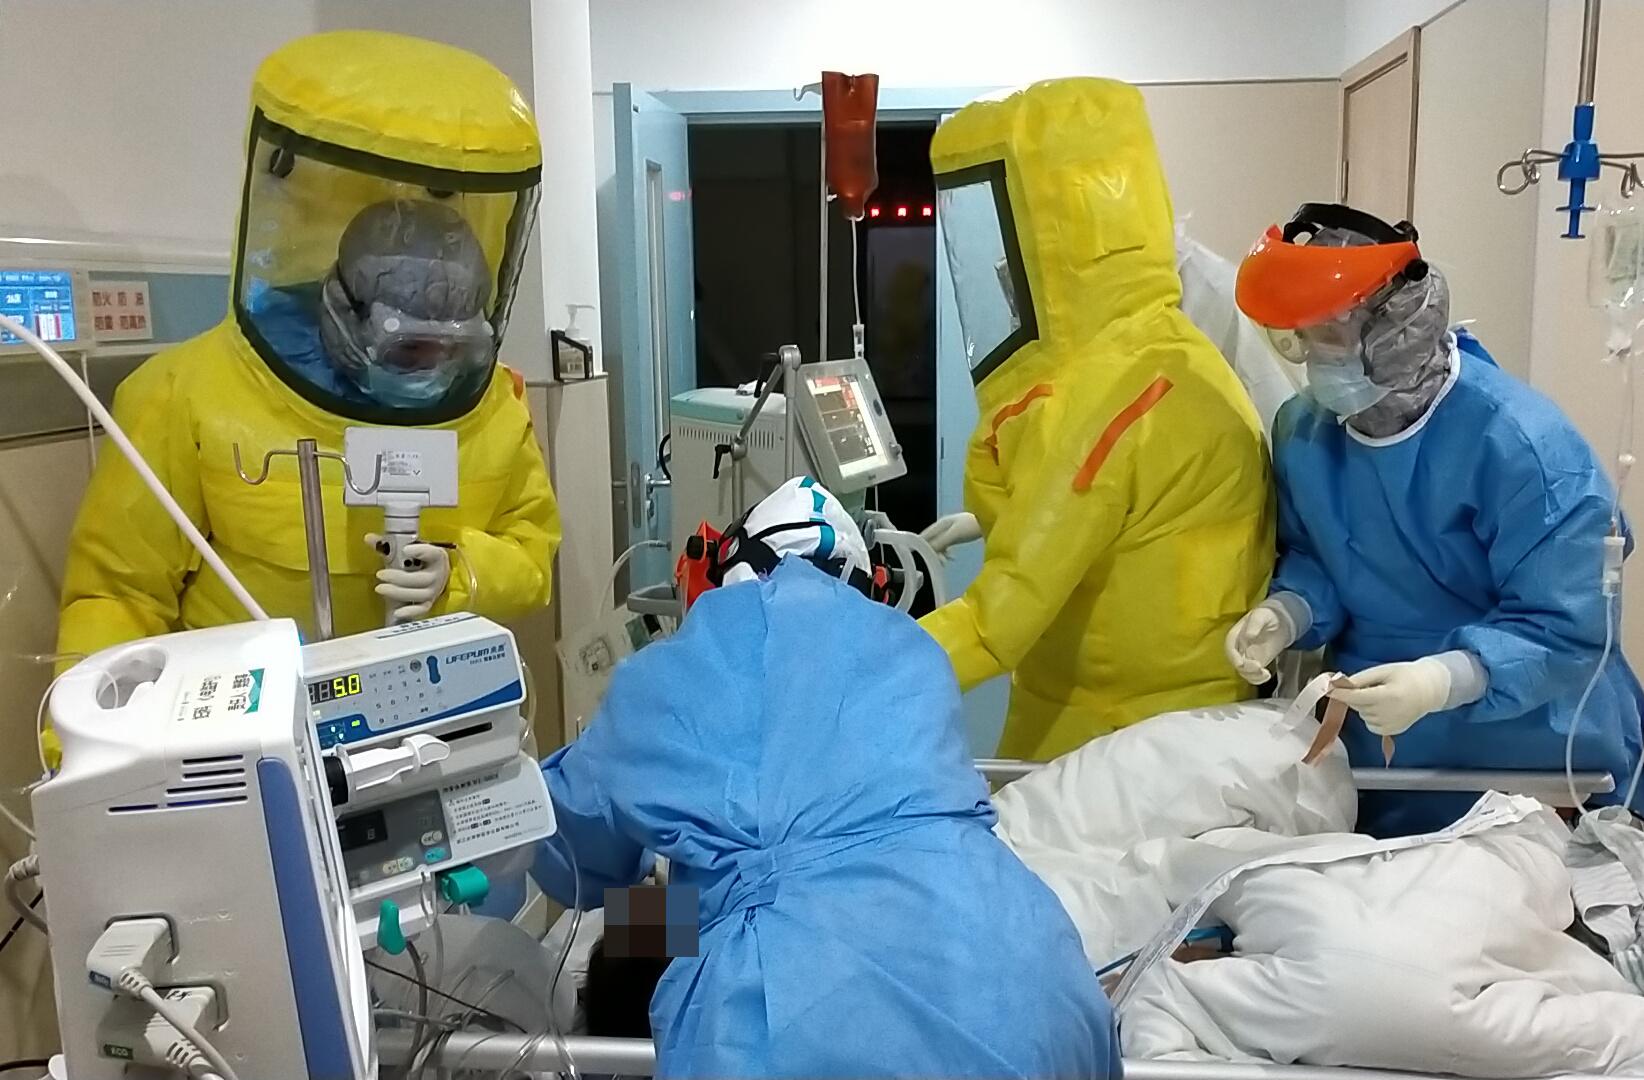 2月15日,�V�|省��口支援湖北�G州�t�����T、南方�t科大�W南方�t院的�t�o人�T在�G州救治患者。